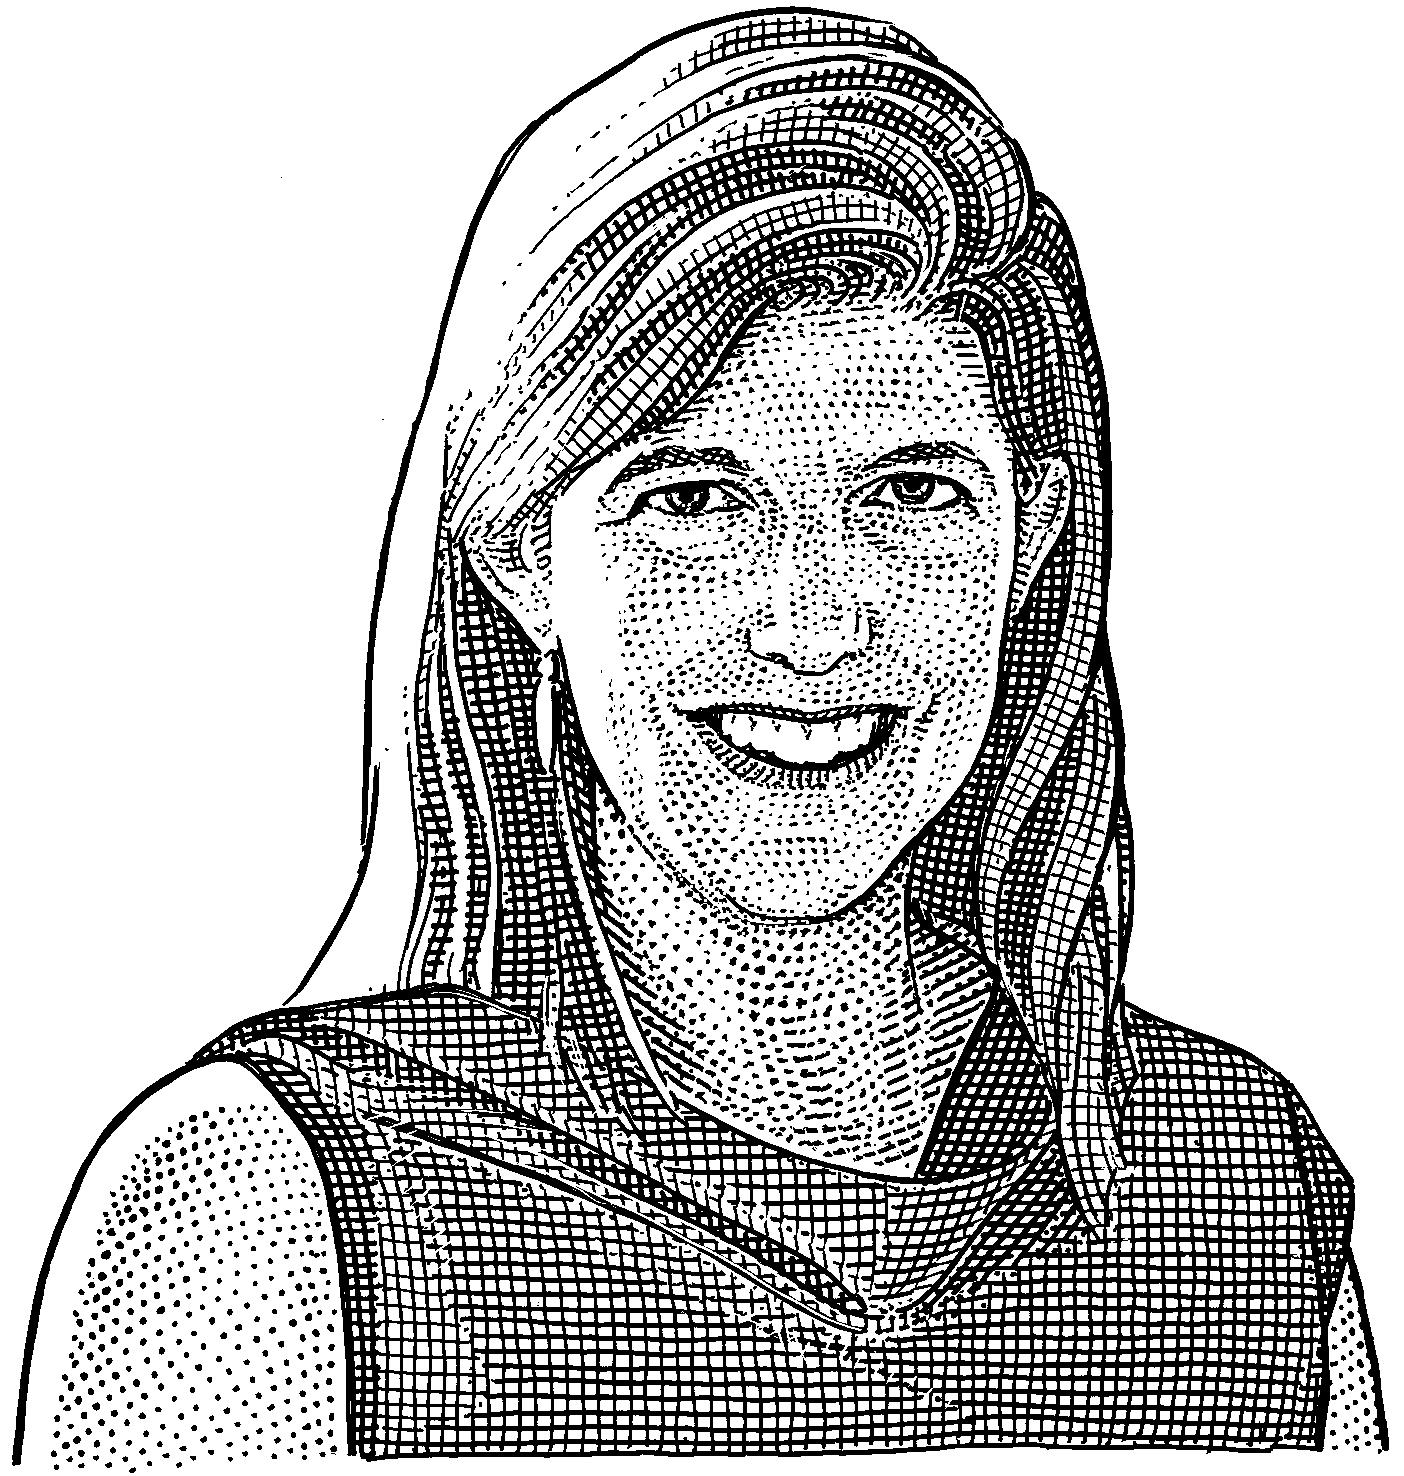 Susan Lehman